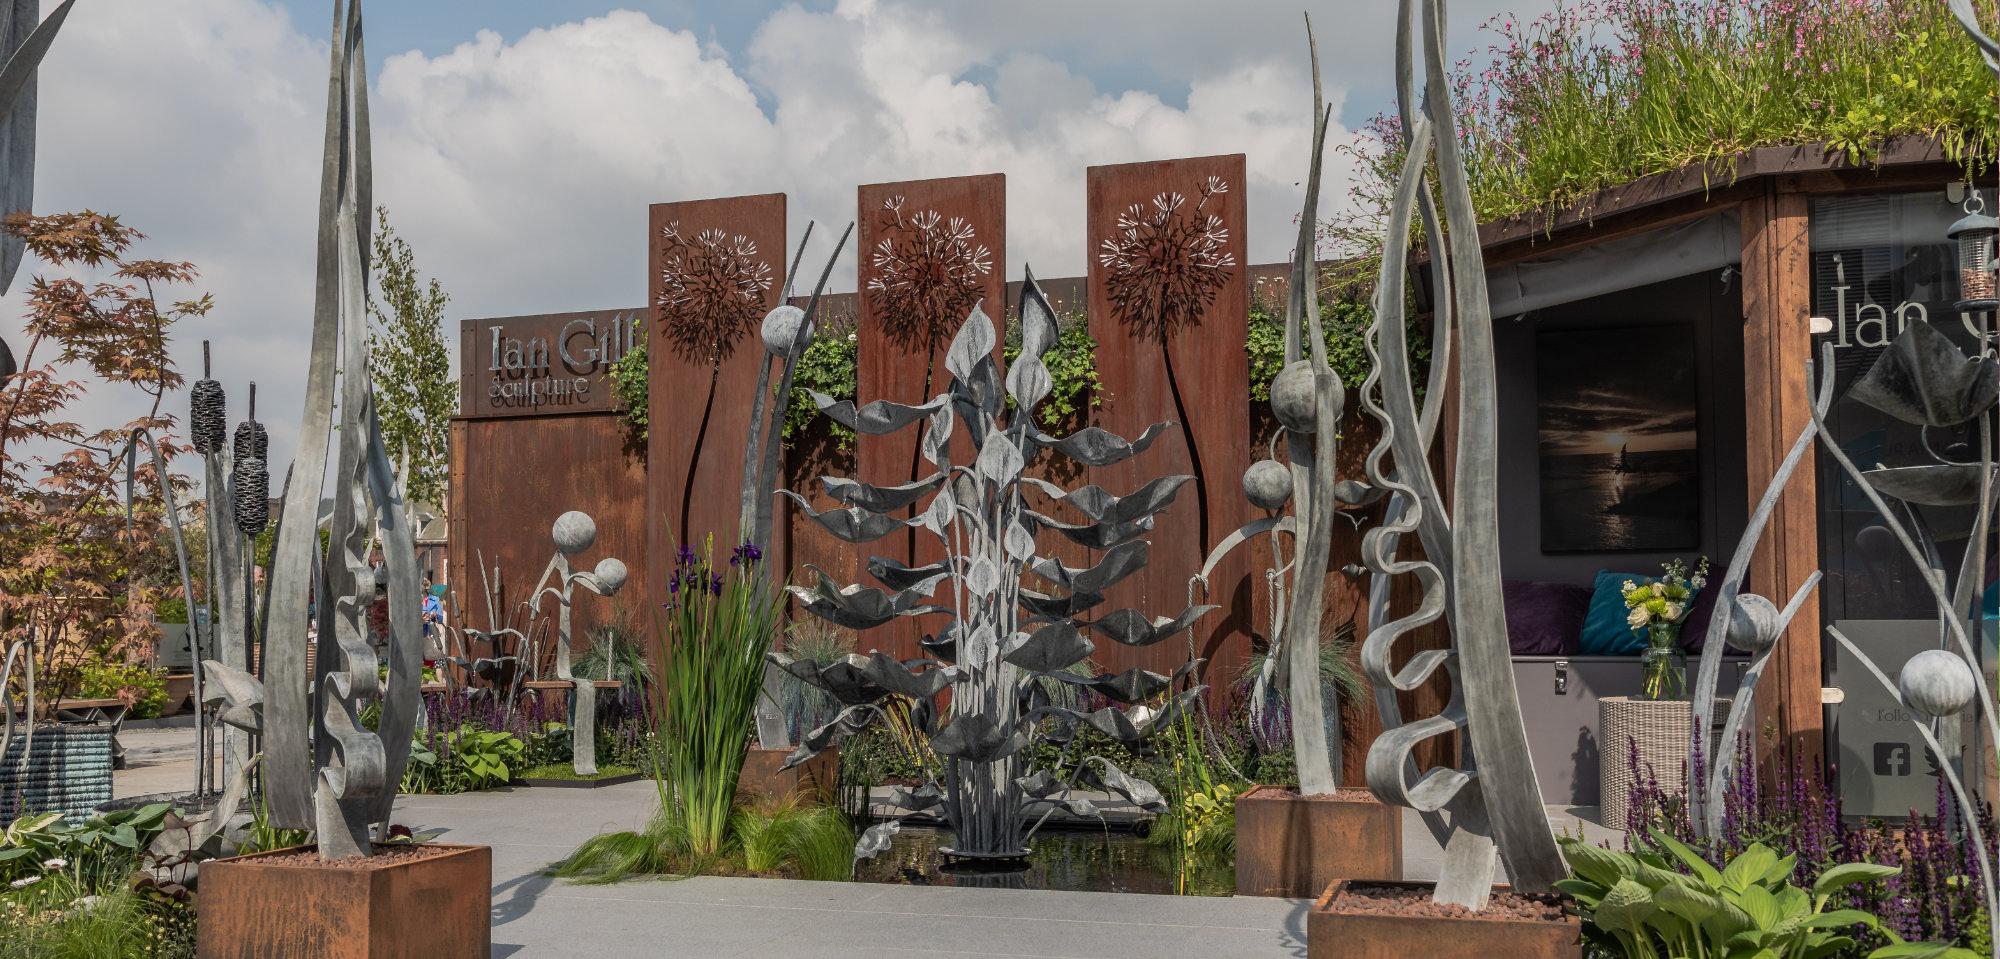 Ian Gill Sculpture at Chelsea Flower Show